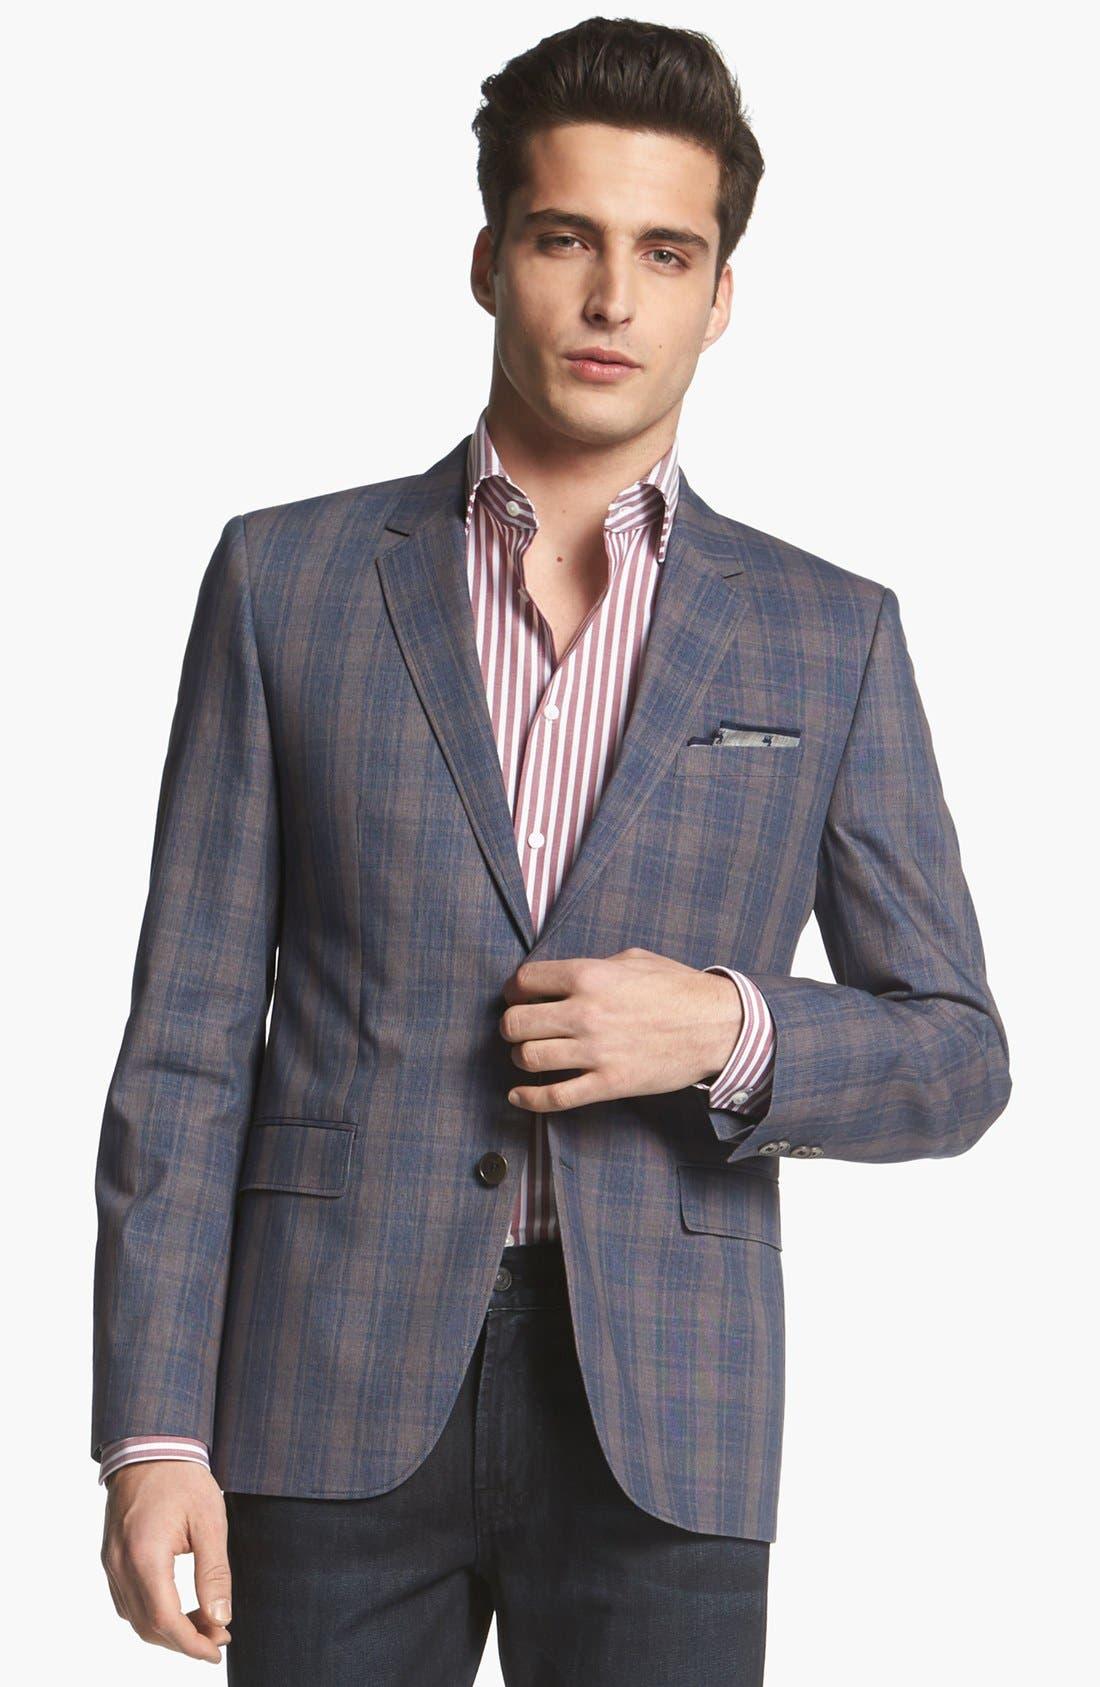 HUGO 'Aeris' Extra Trim Fit Cotton Sportcoat,                         Main,                         color, Navy